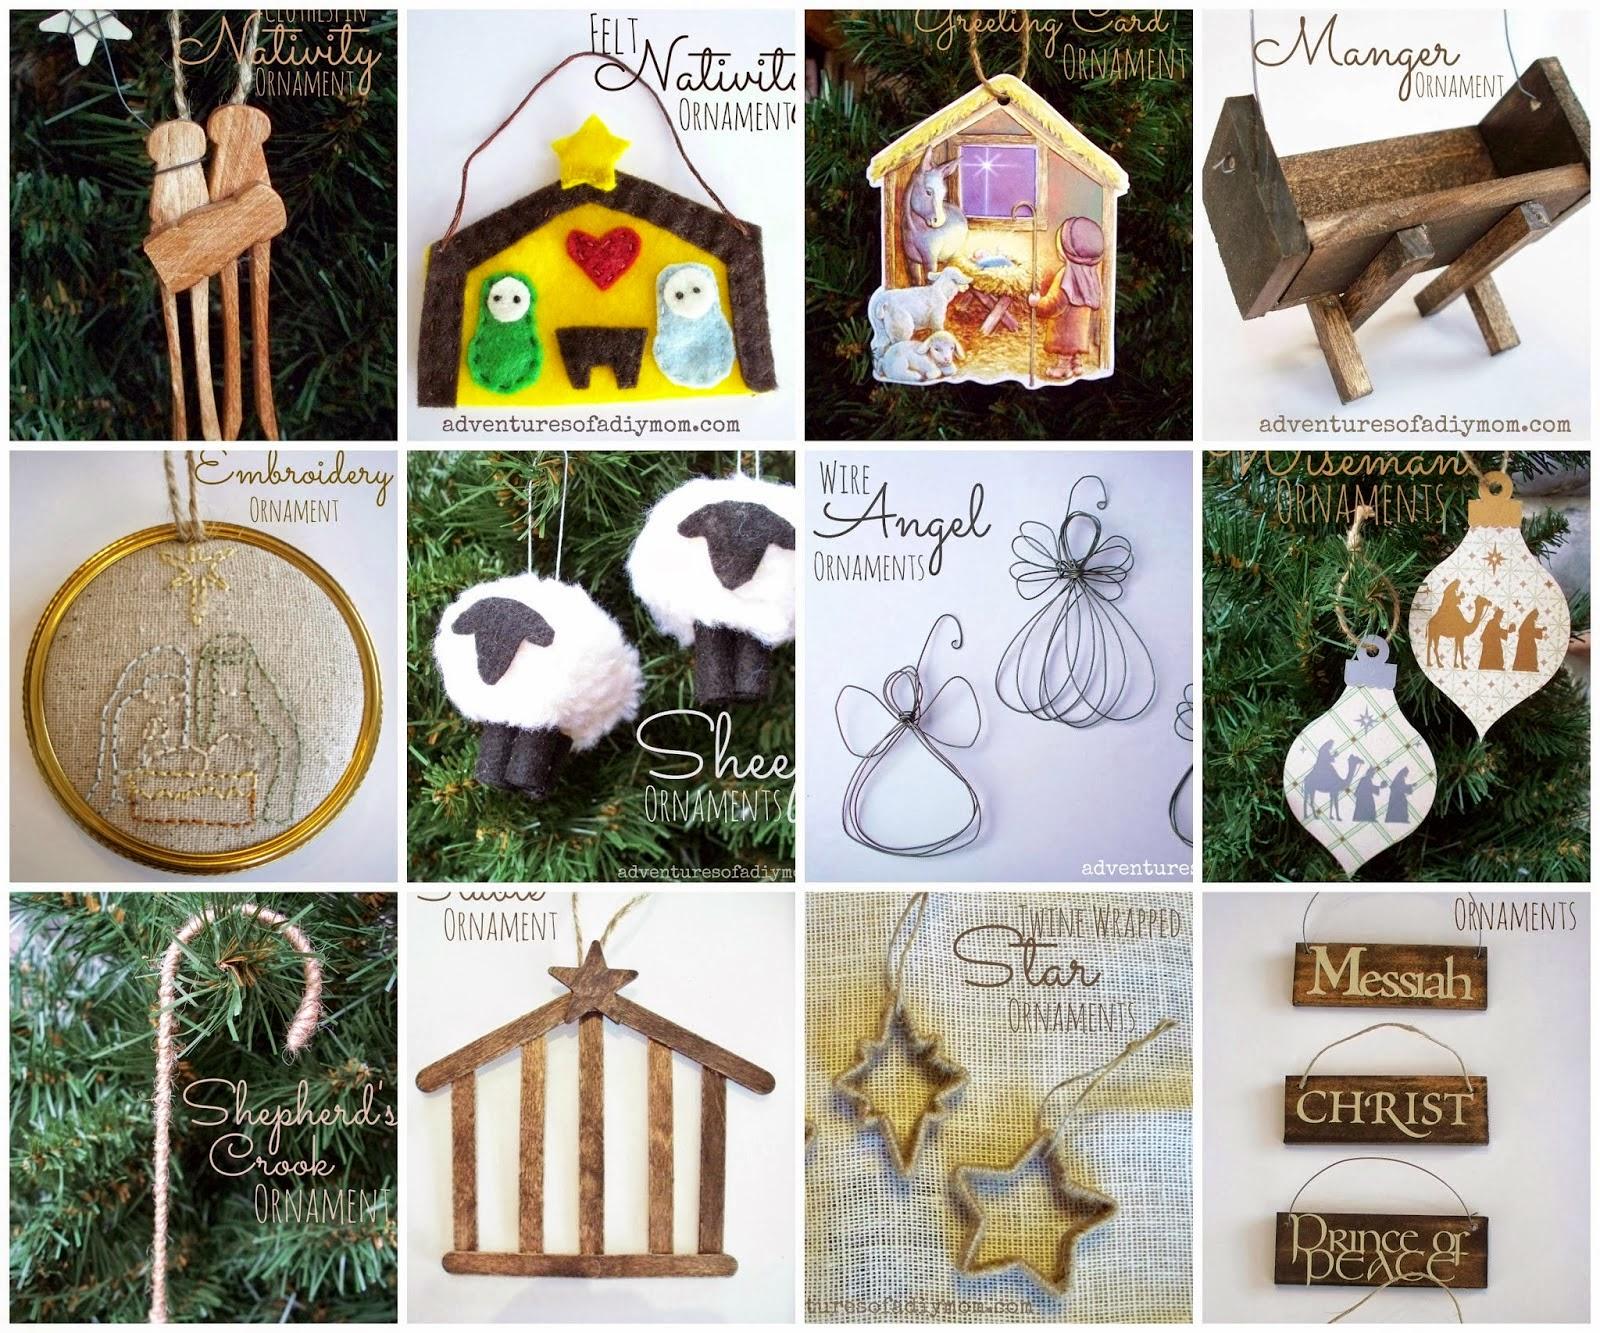 20 DIY Ornaments about Jesus Christ